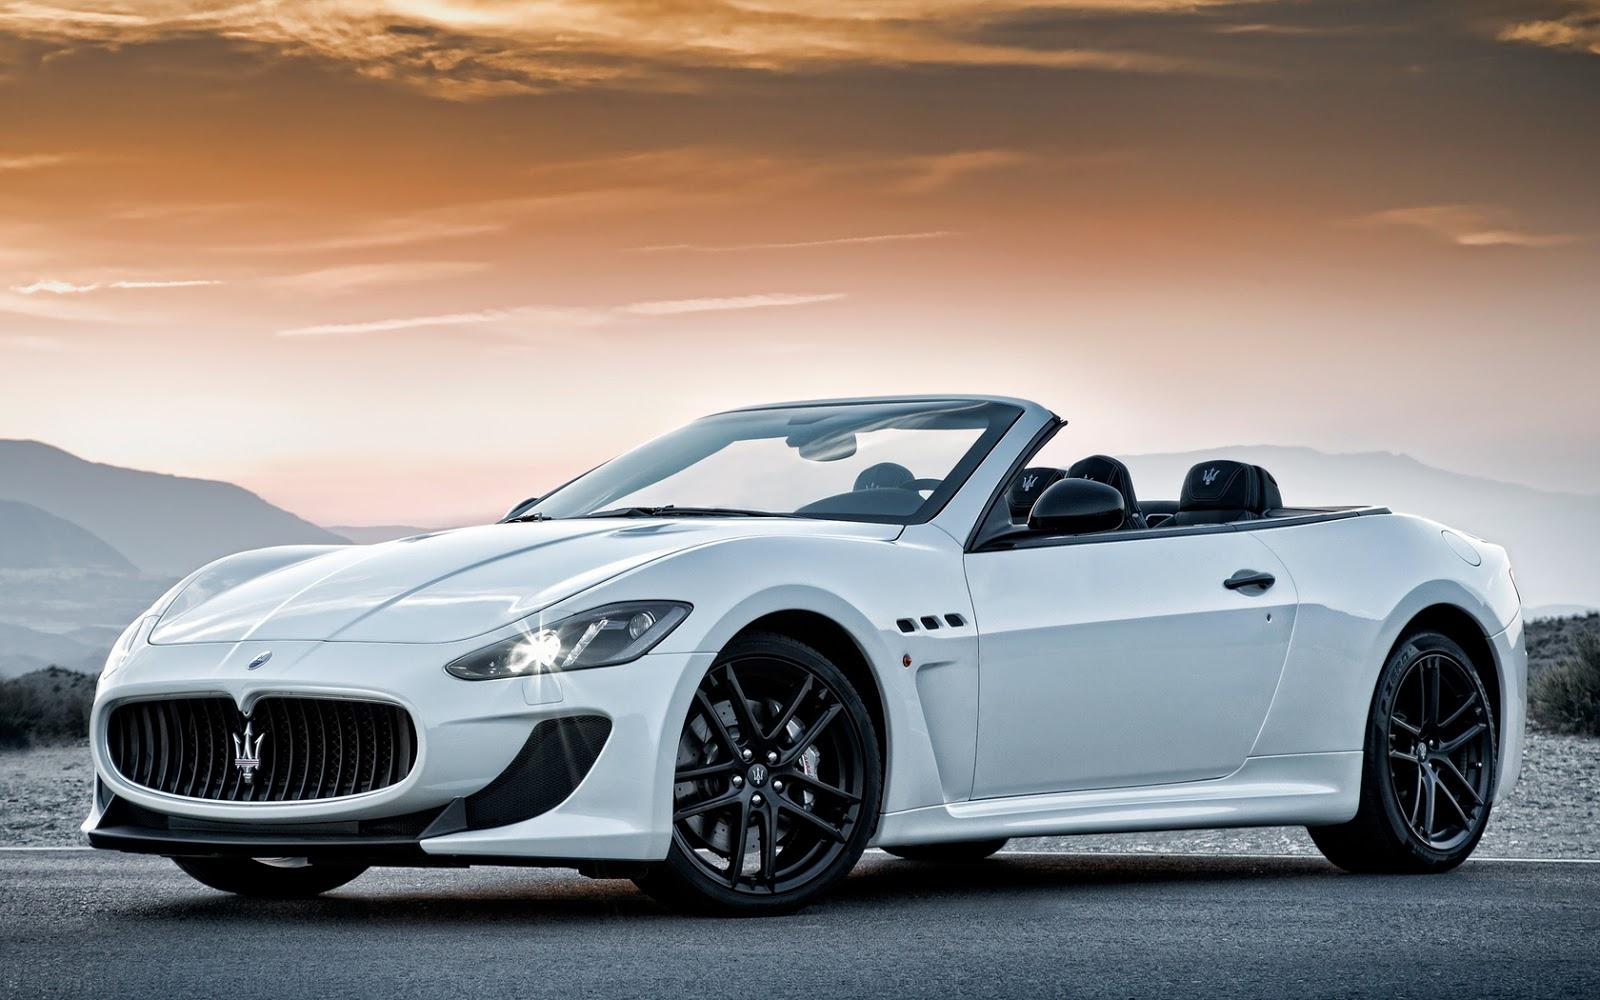 Cars Hd Wallpapers Maserati Granturismo Best Hd Picture